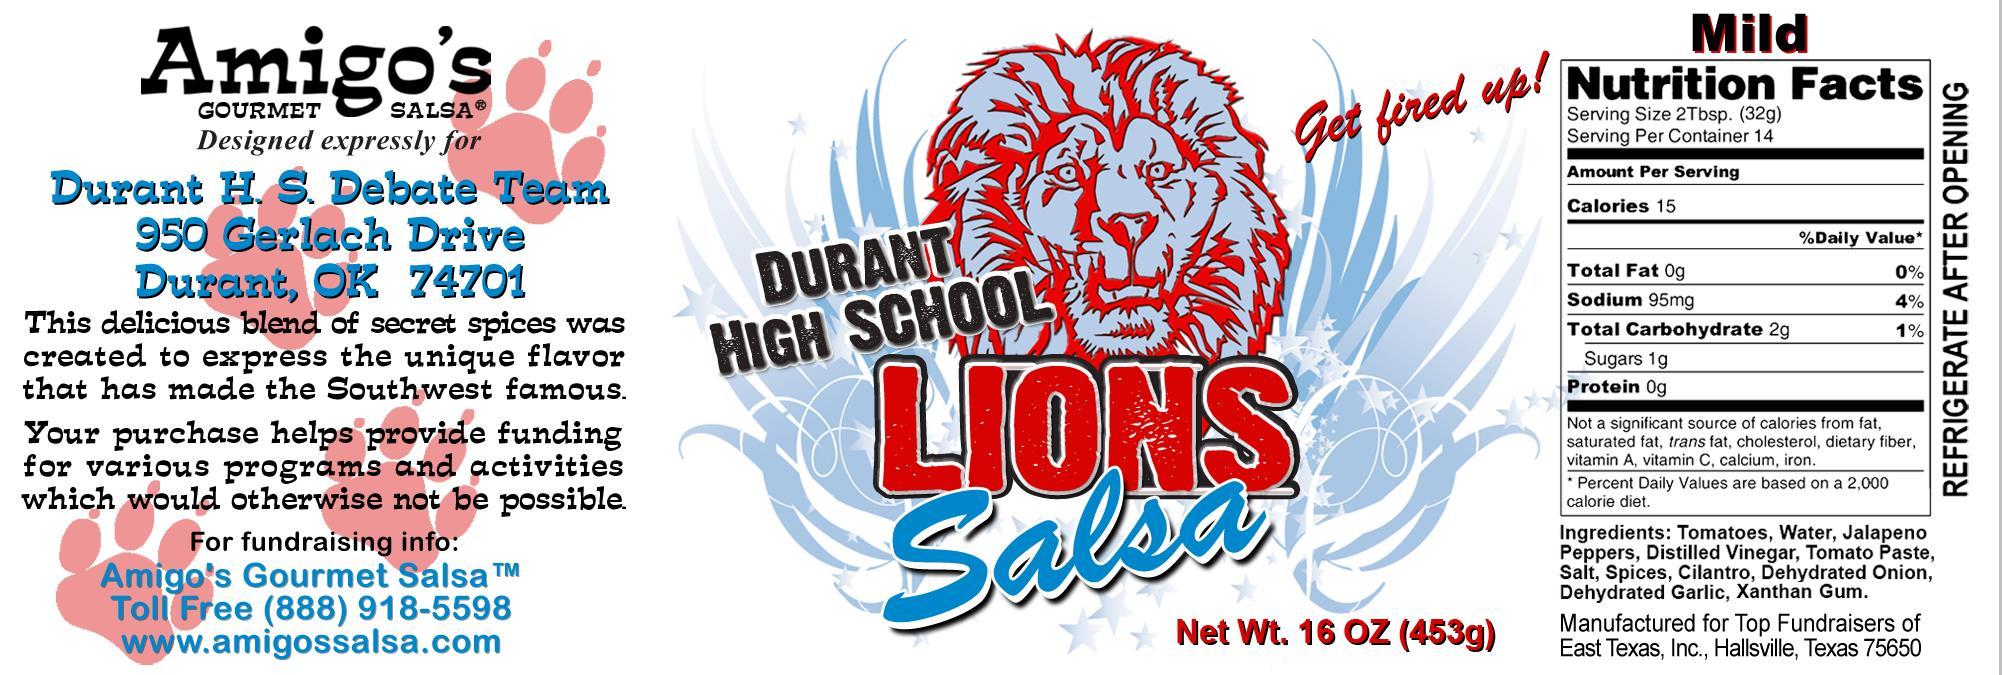 Durant Lions Jar HOT 2012 small MILD.jpg